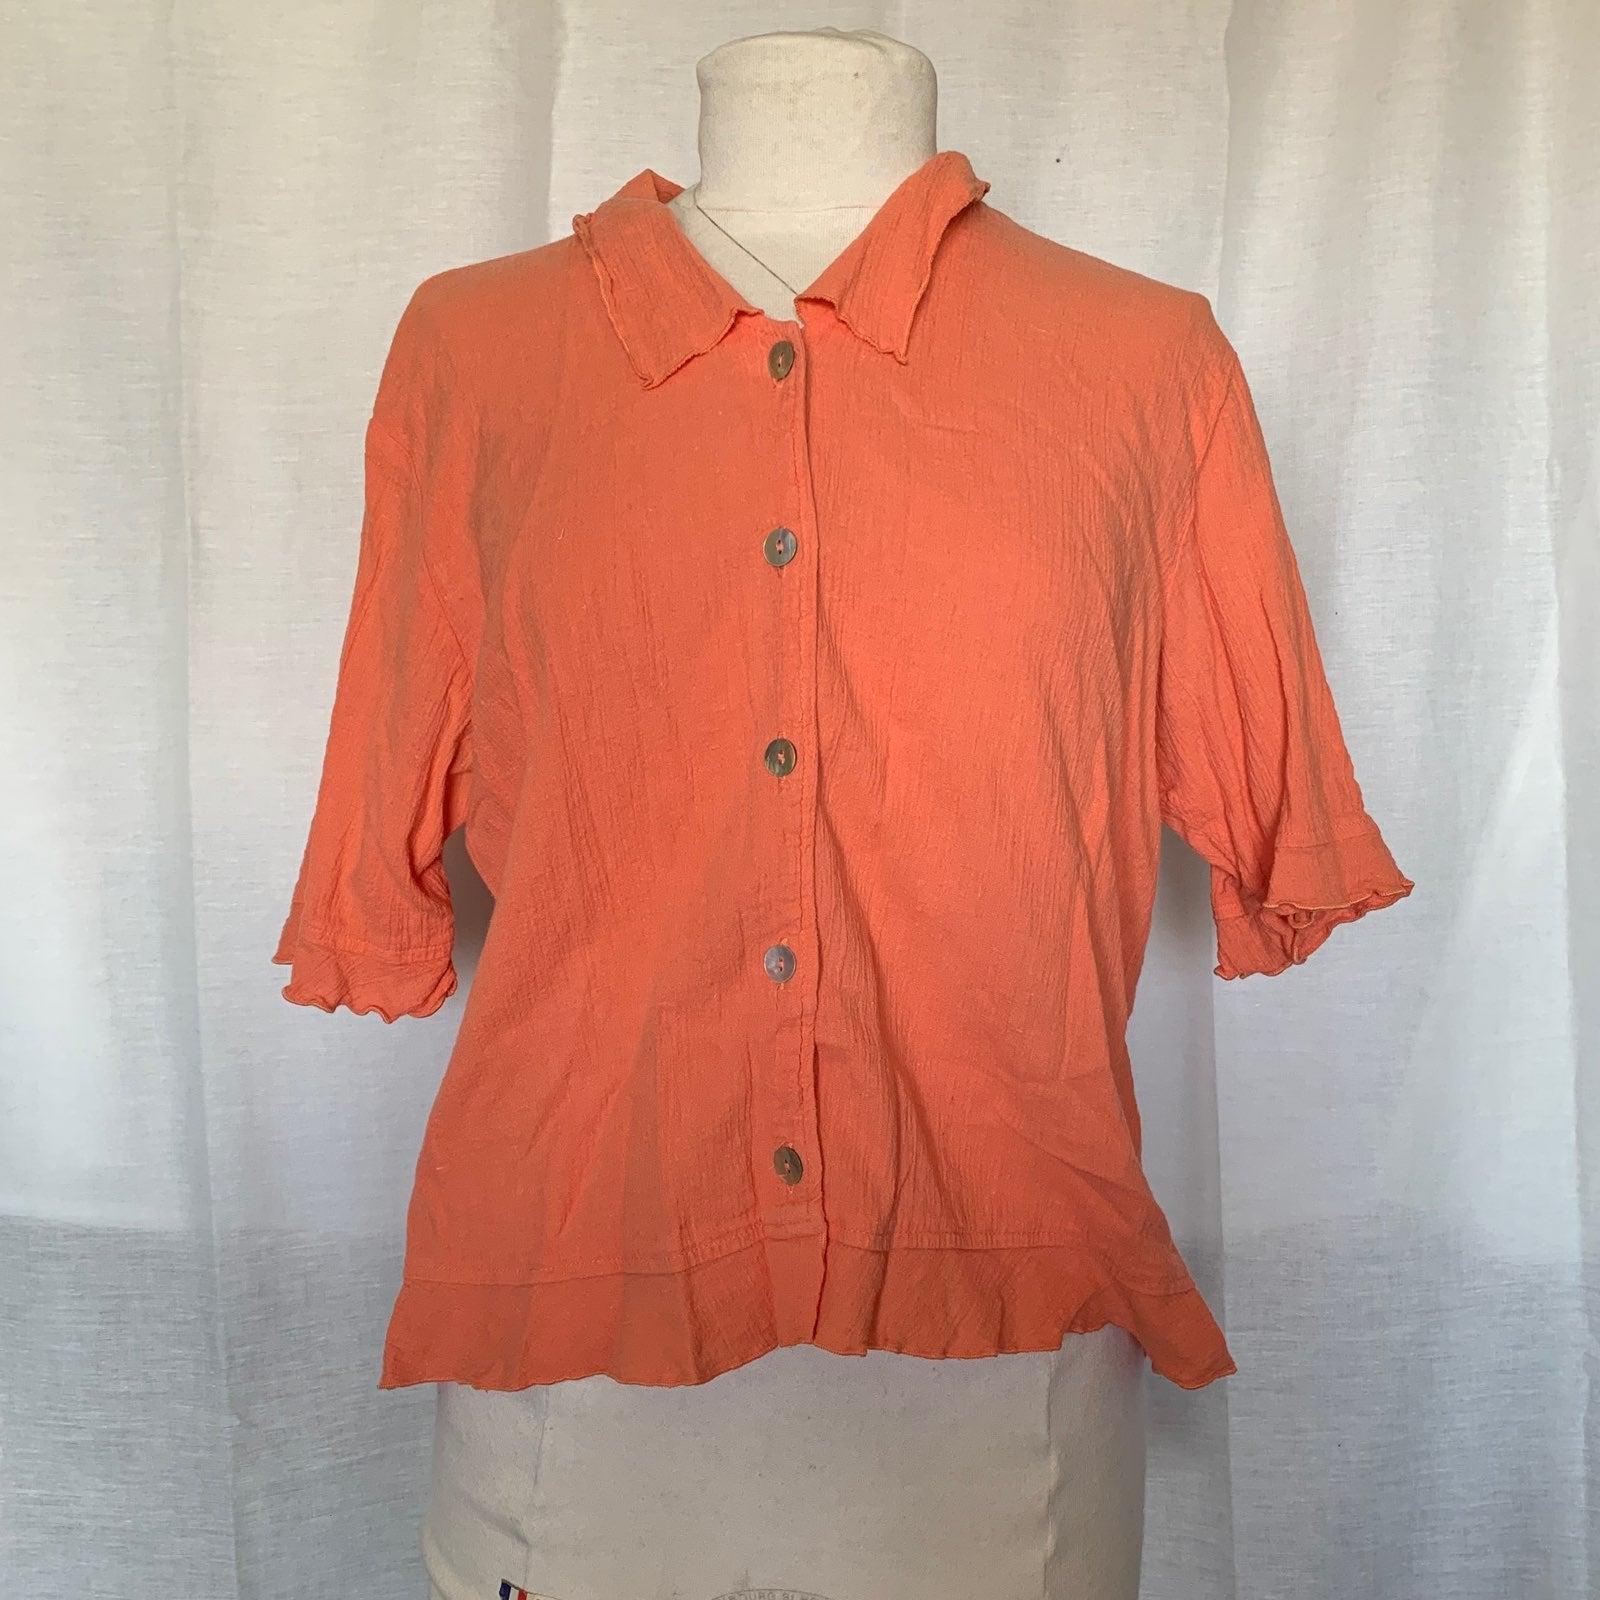 J. Jill Orange Button Up Blouse Shirt